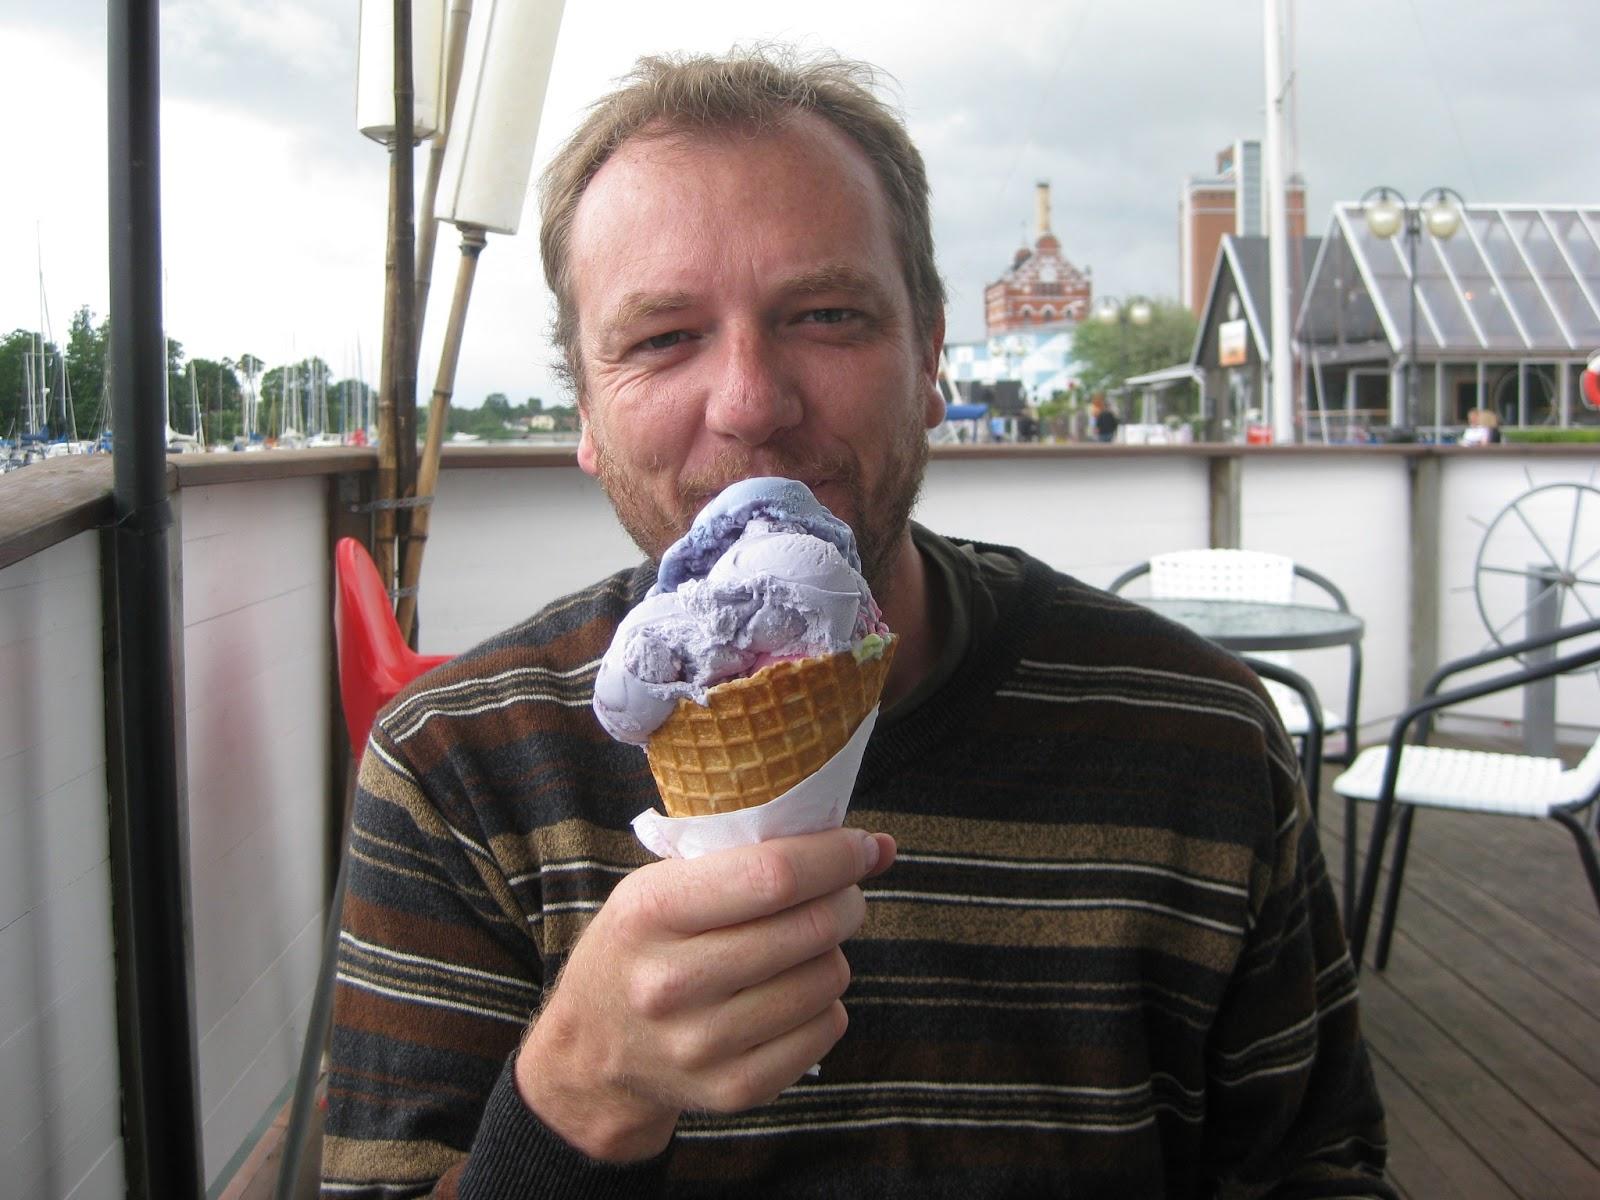 image of man eating ice cream cone